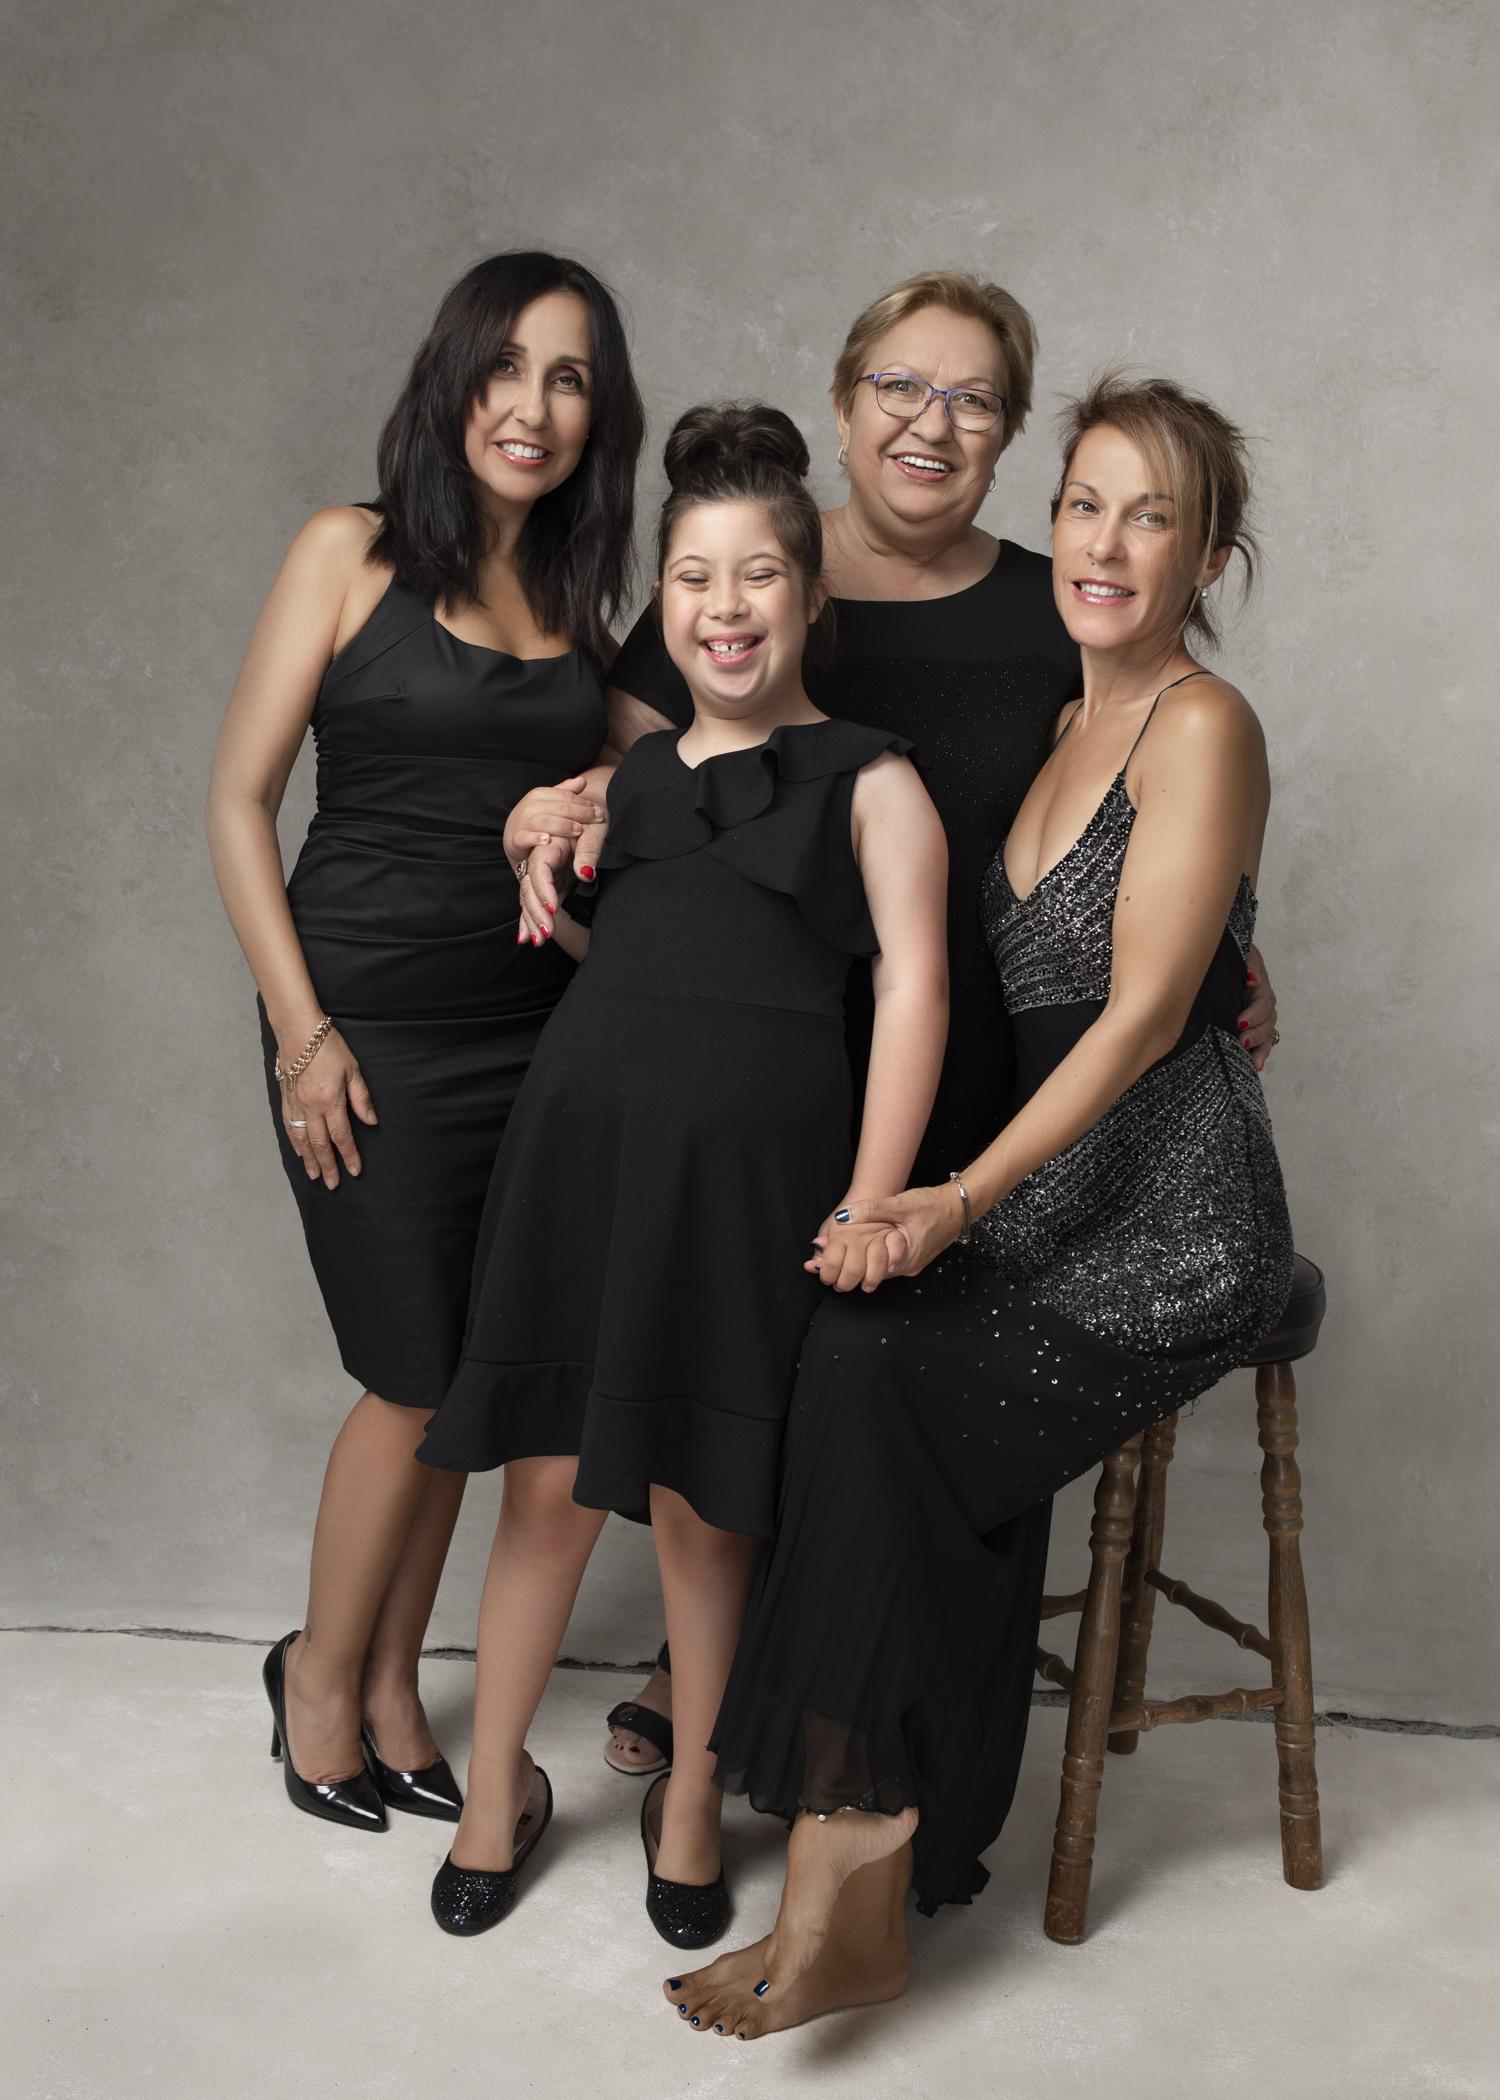 5X7%22 Minilab Lustre Generations Latinas9Analia Paino Portrait Photography.jpg